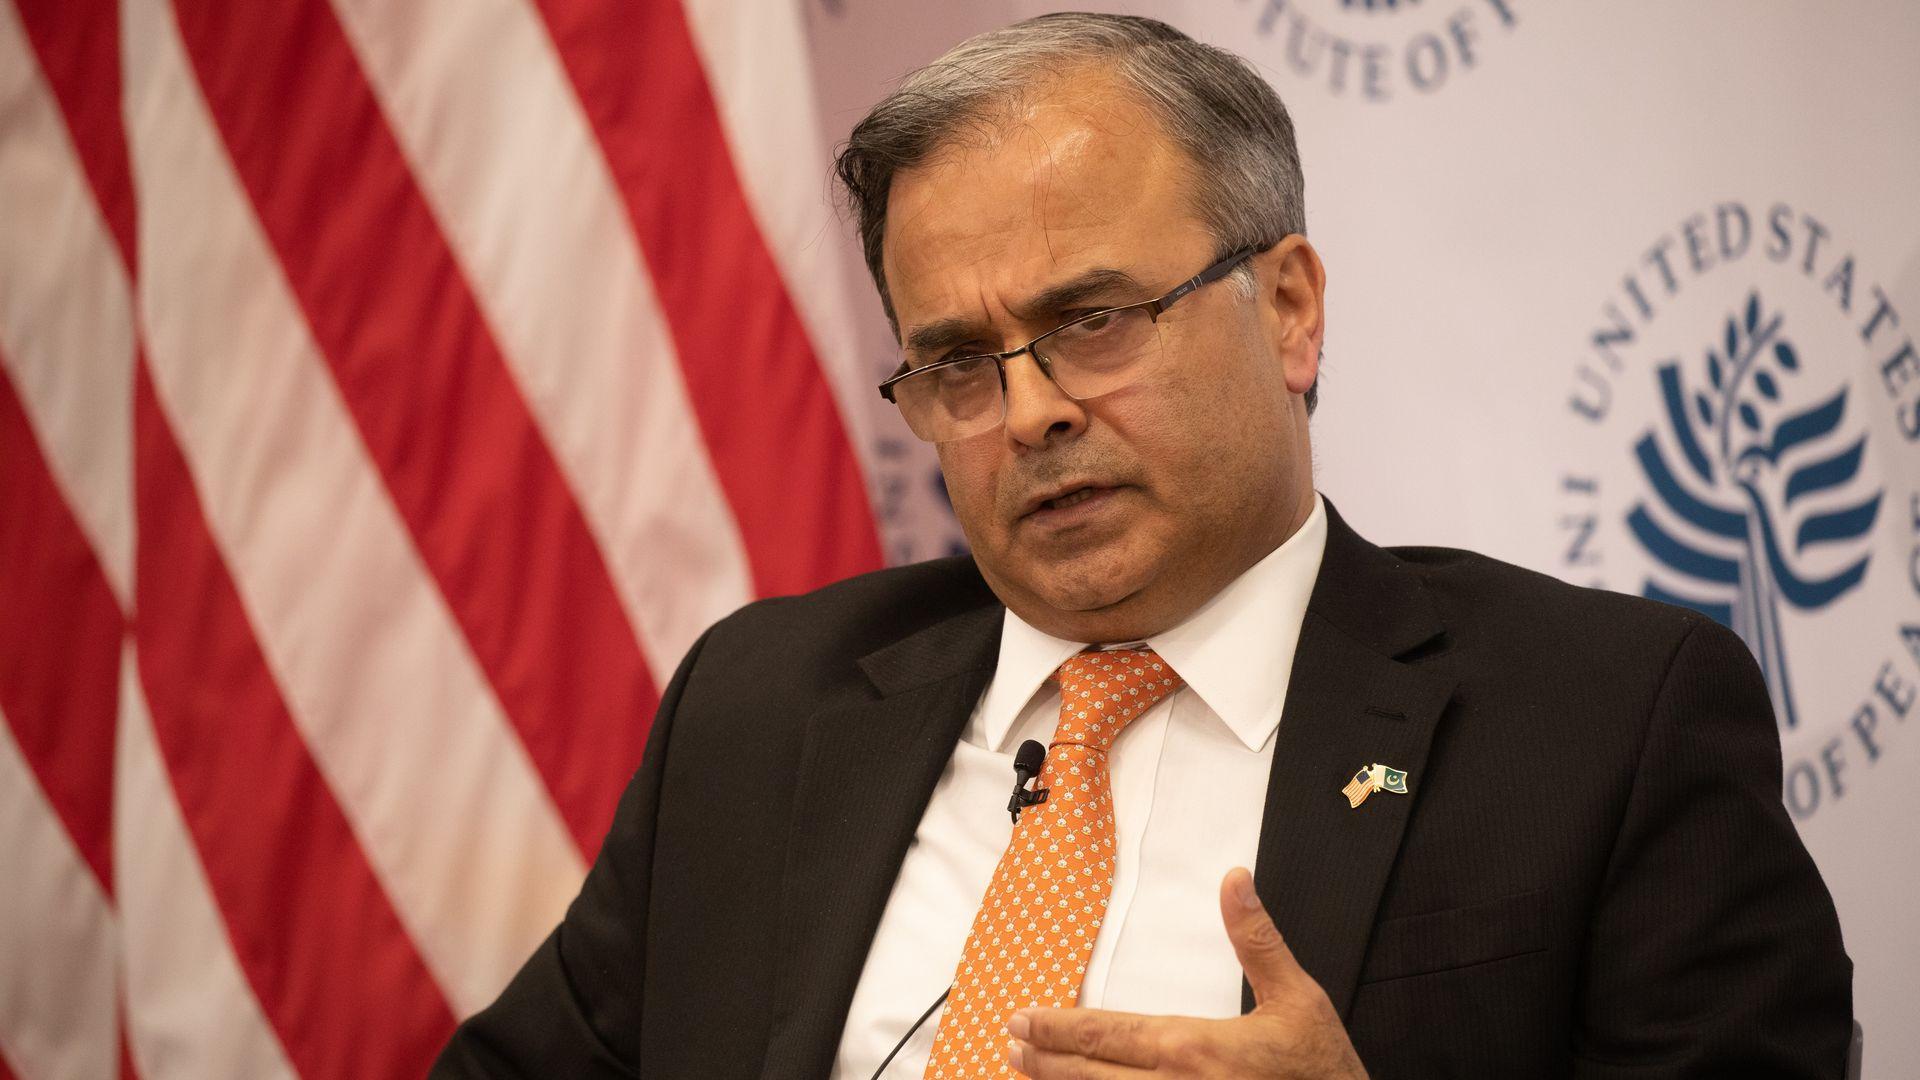 Pakistan's Ambassador to the U.S. Asad Majeed Khan.